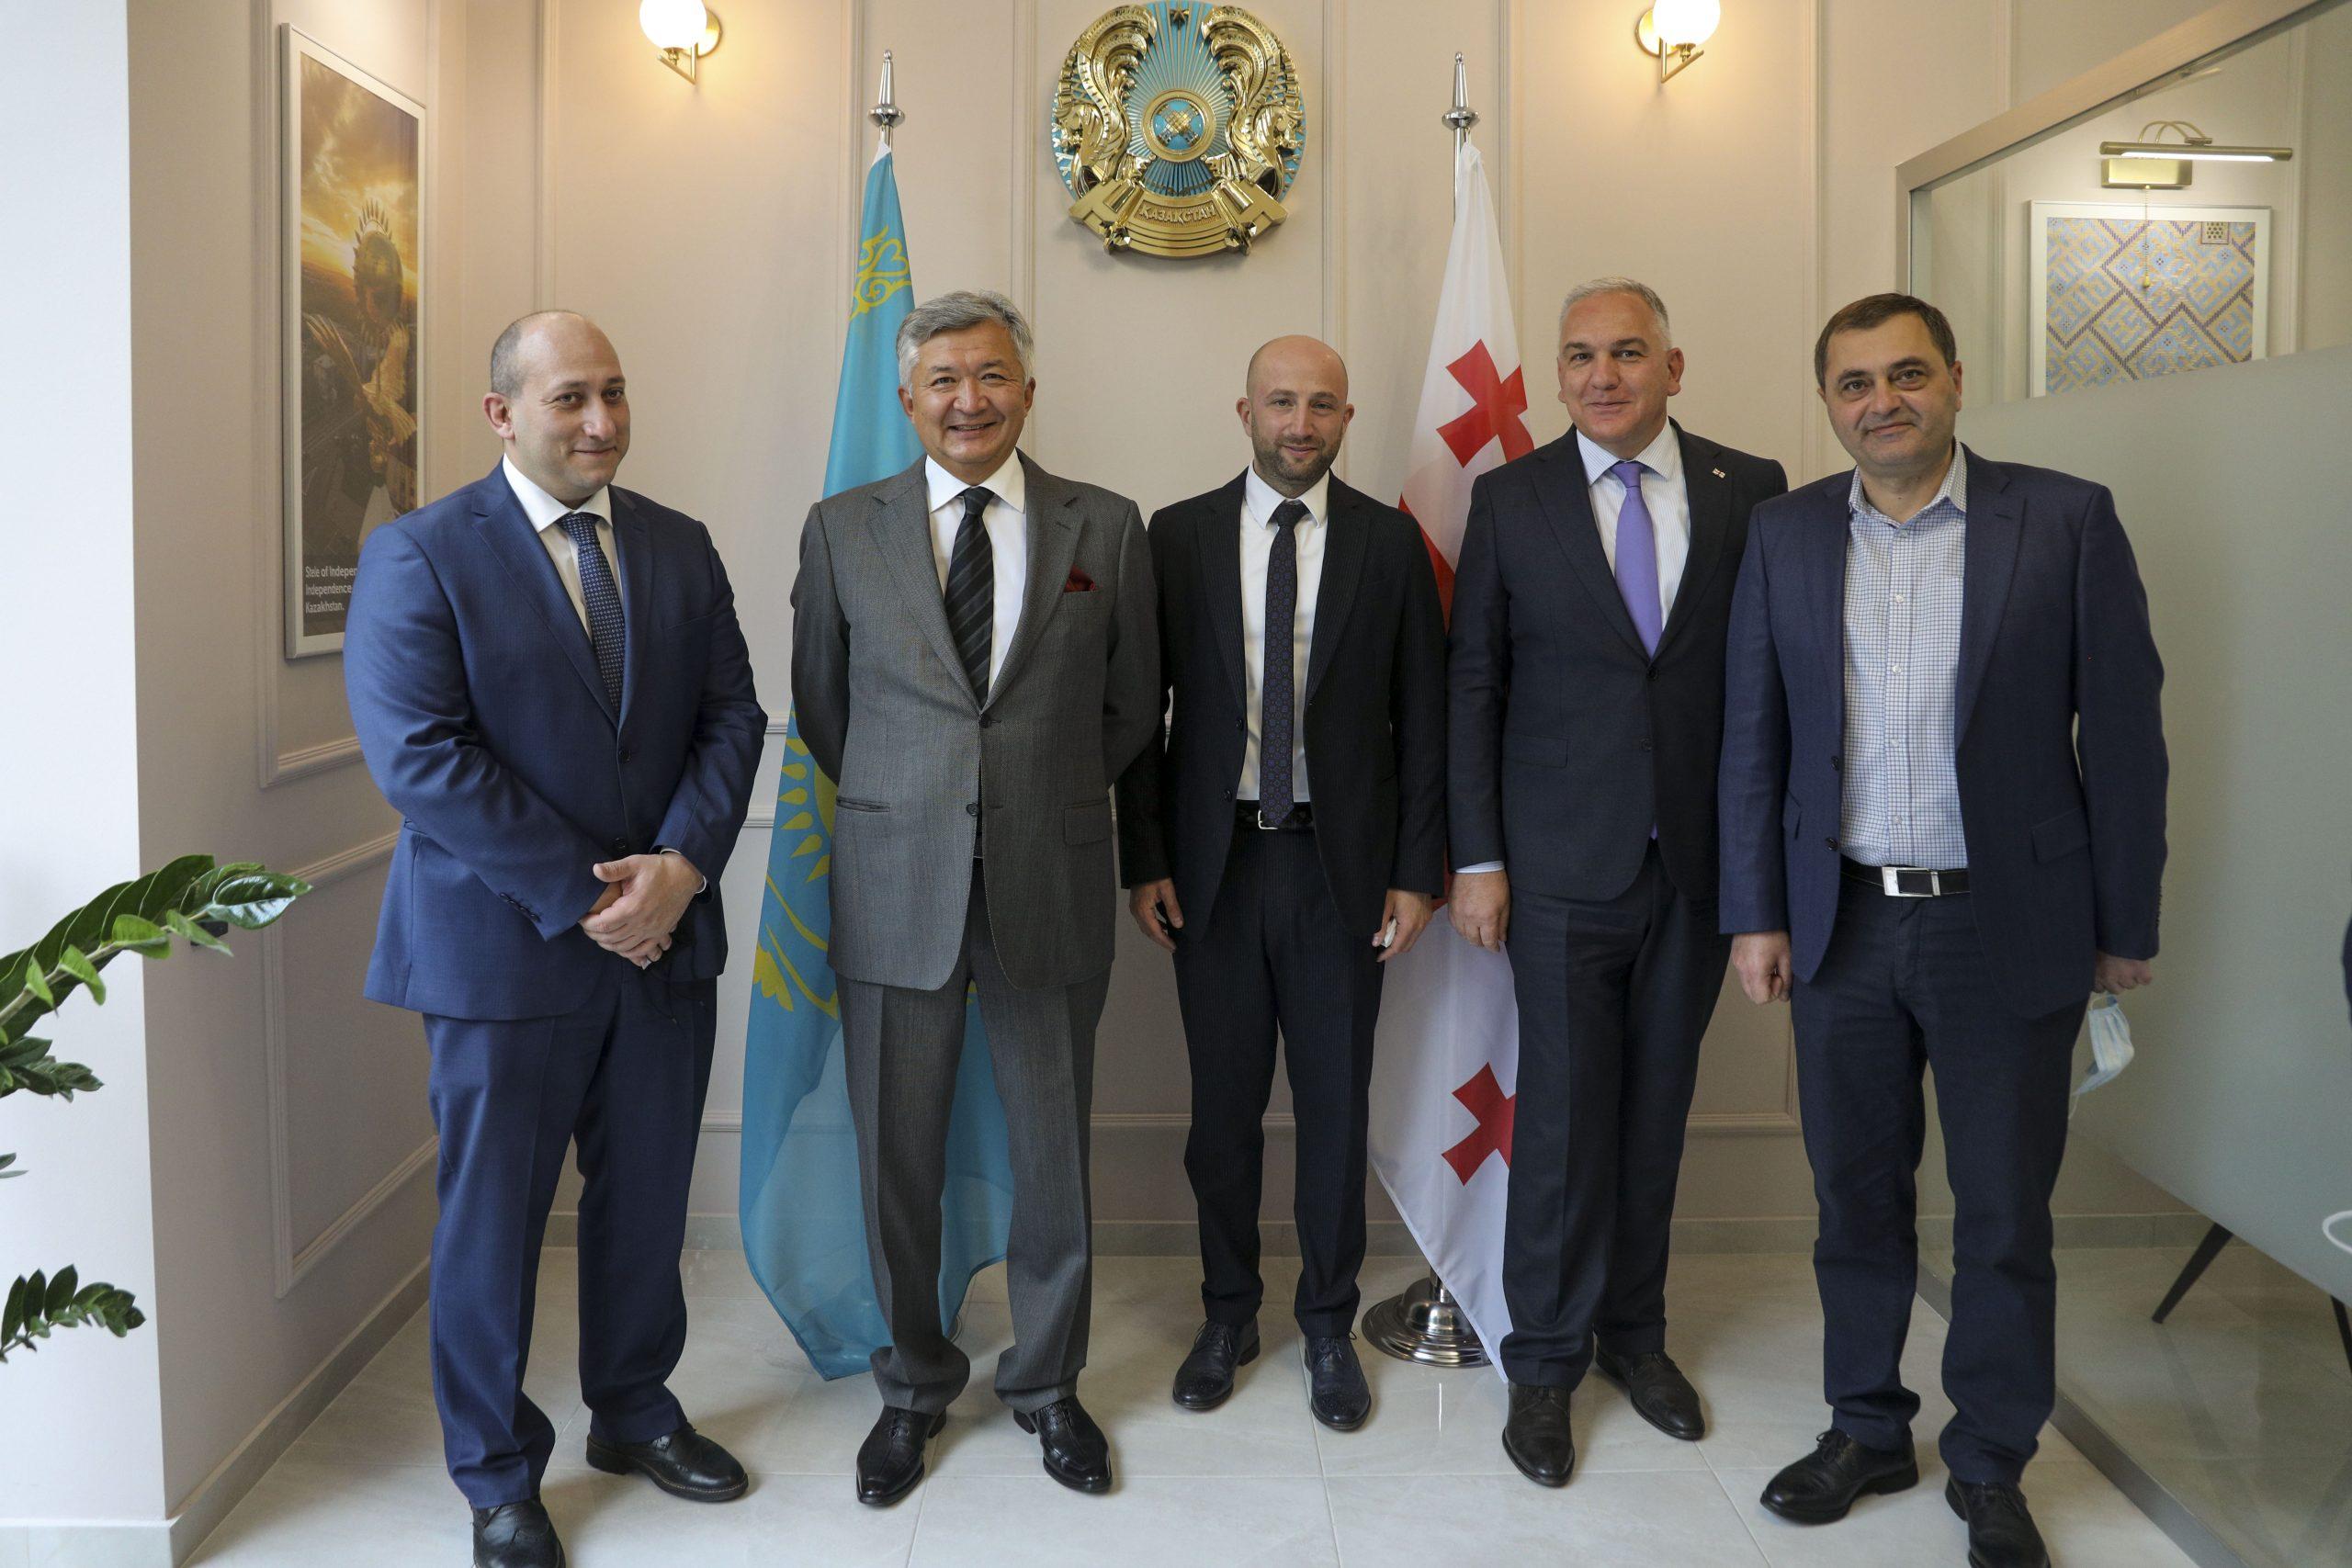 Cover scaled #новости Александр Хвтисиашвили, Бауржан Мухамеджанов, Георгий Джахуташвили, Грузия-Казахстан, Казахстан, консульство